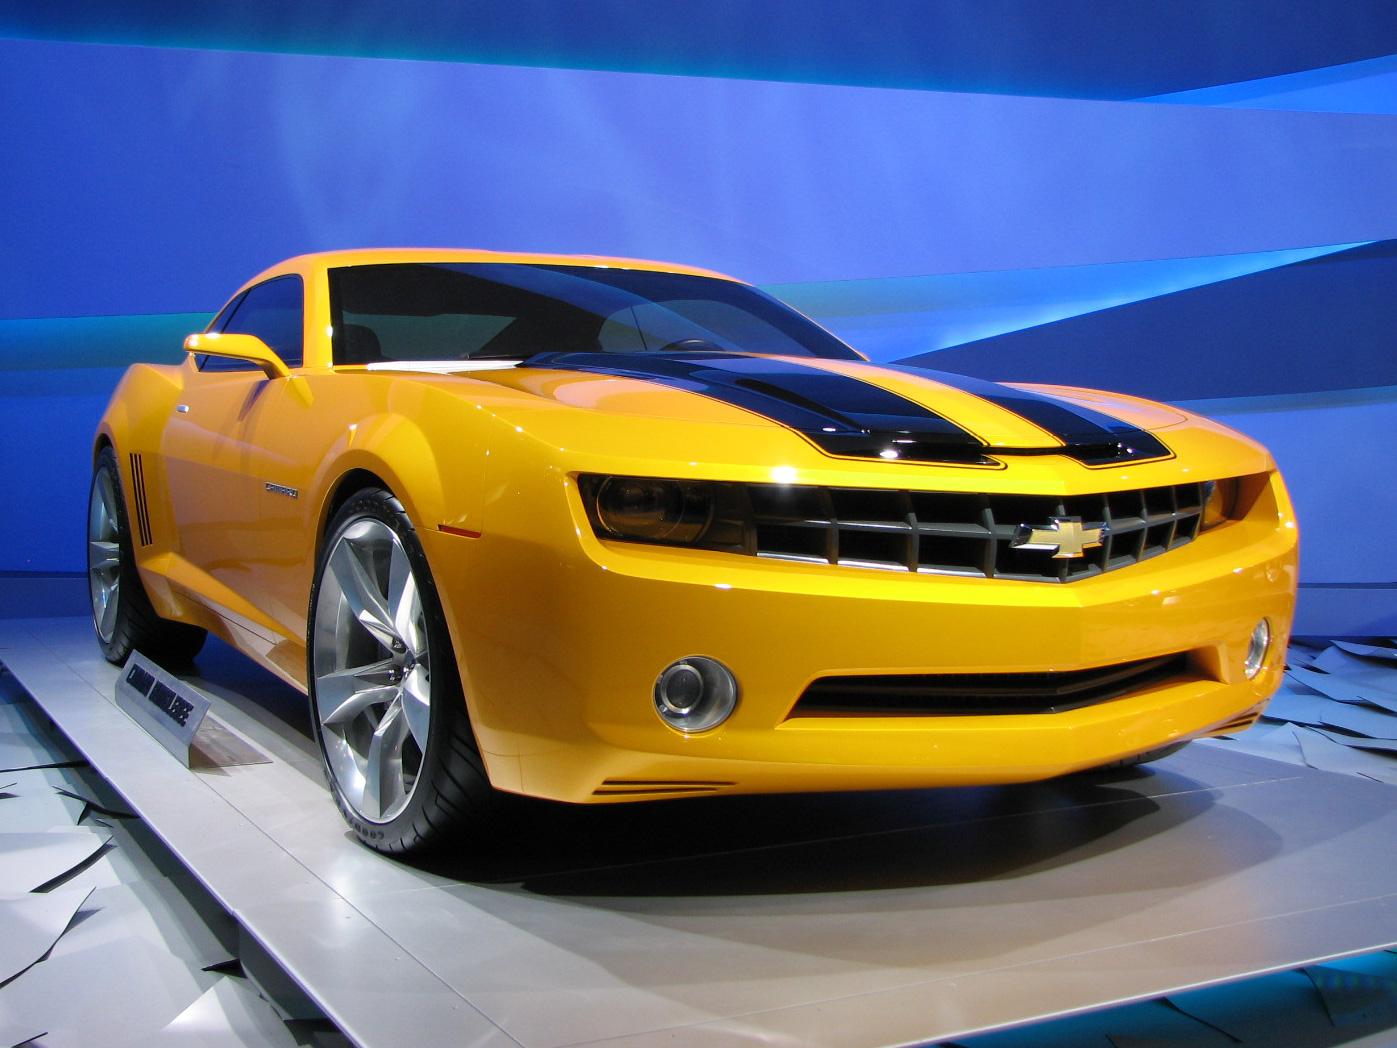 Chevrolet Cruze Facelift World Premiere To Happen Soon